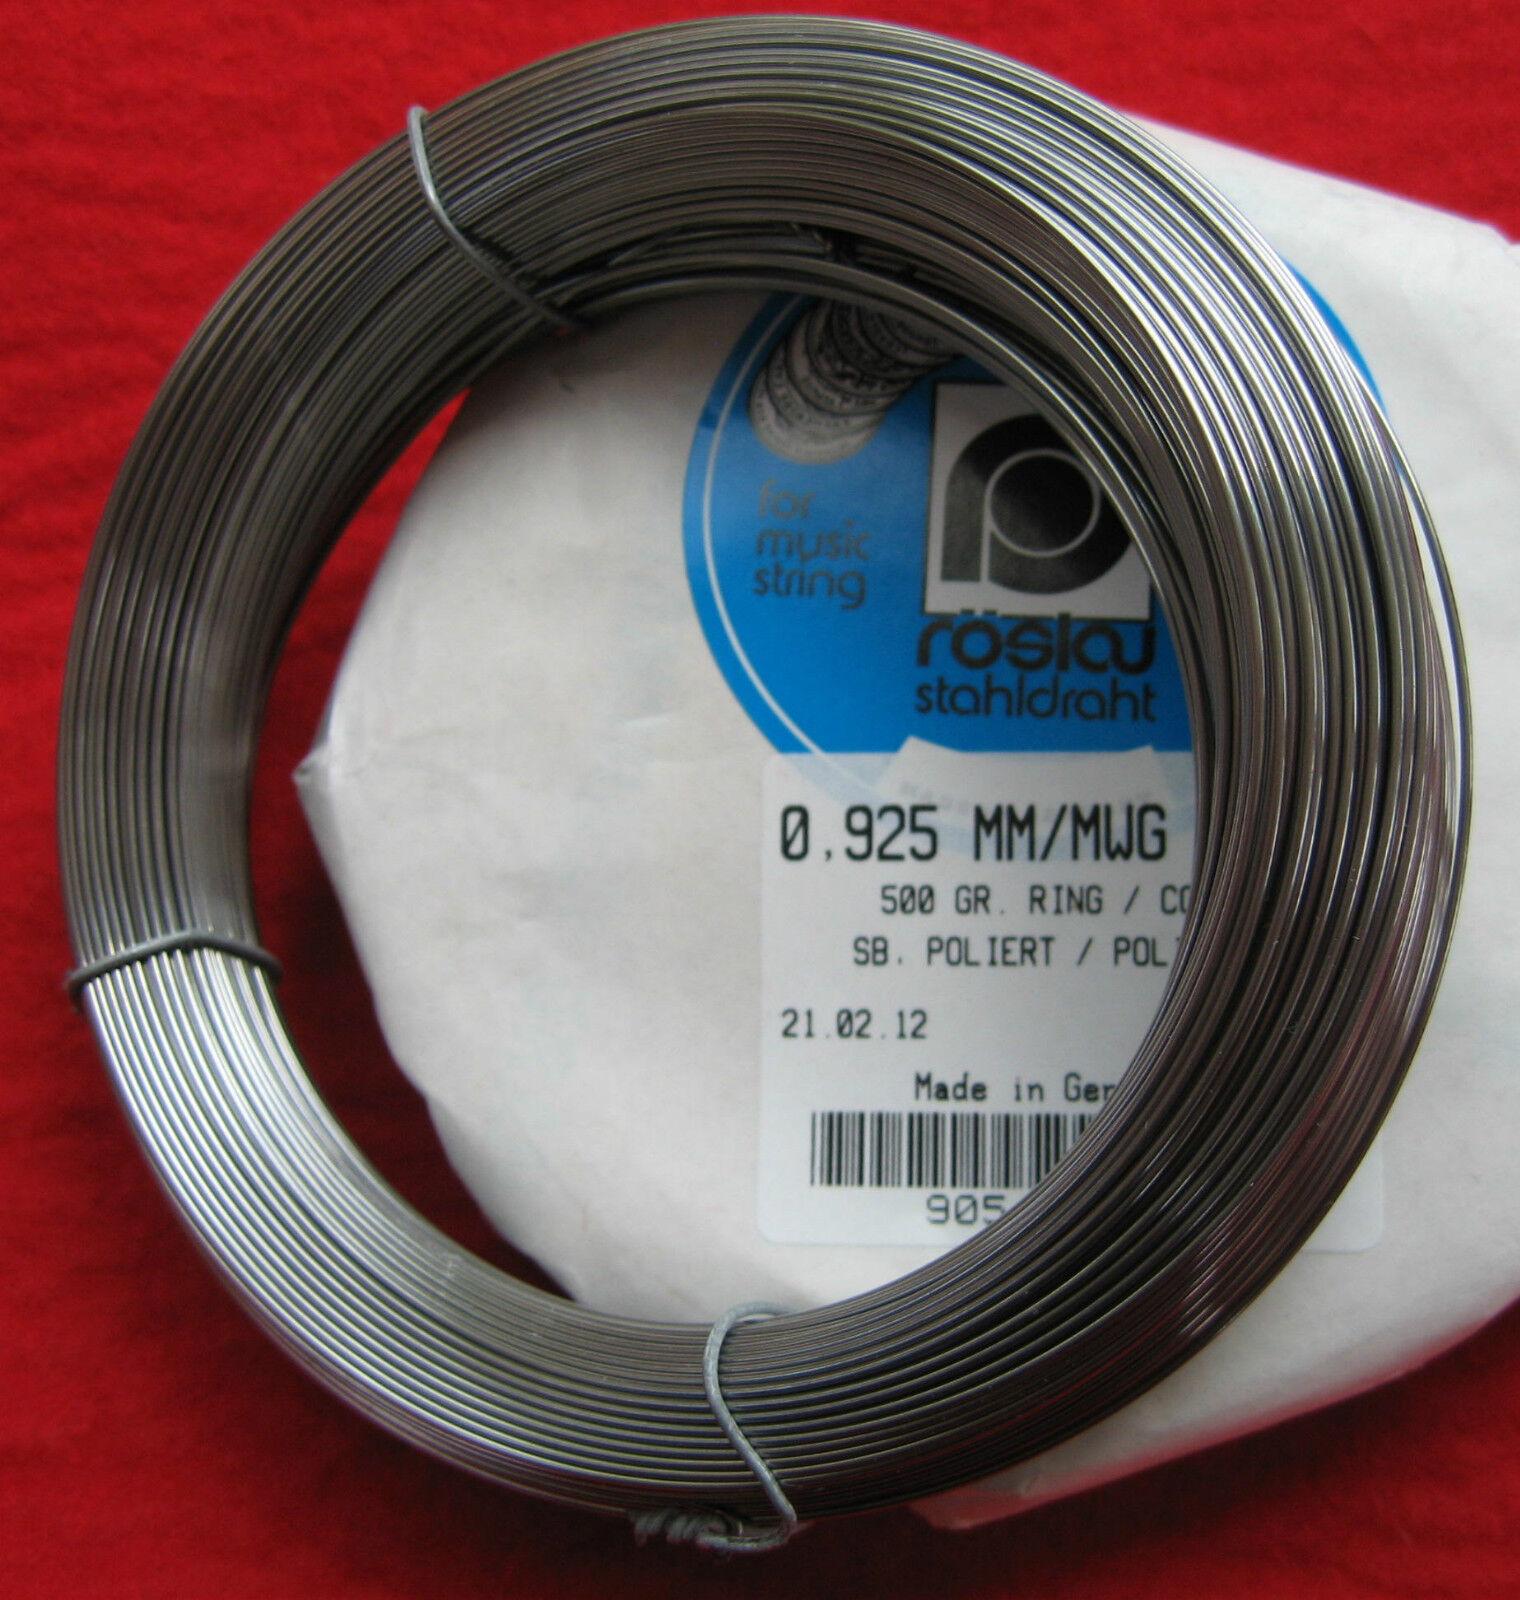 Genuine Piano Wire Spring Steel-'Roslau'-Full 1 2kg (500gram)Pianos Harpsichords